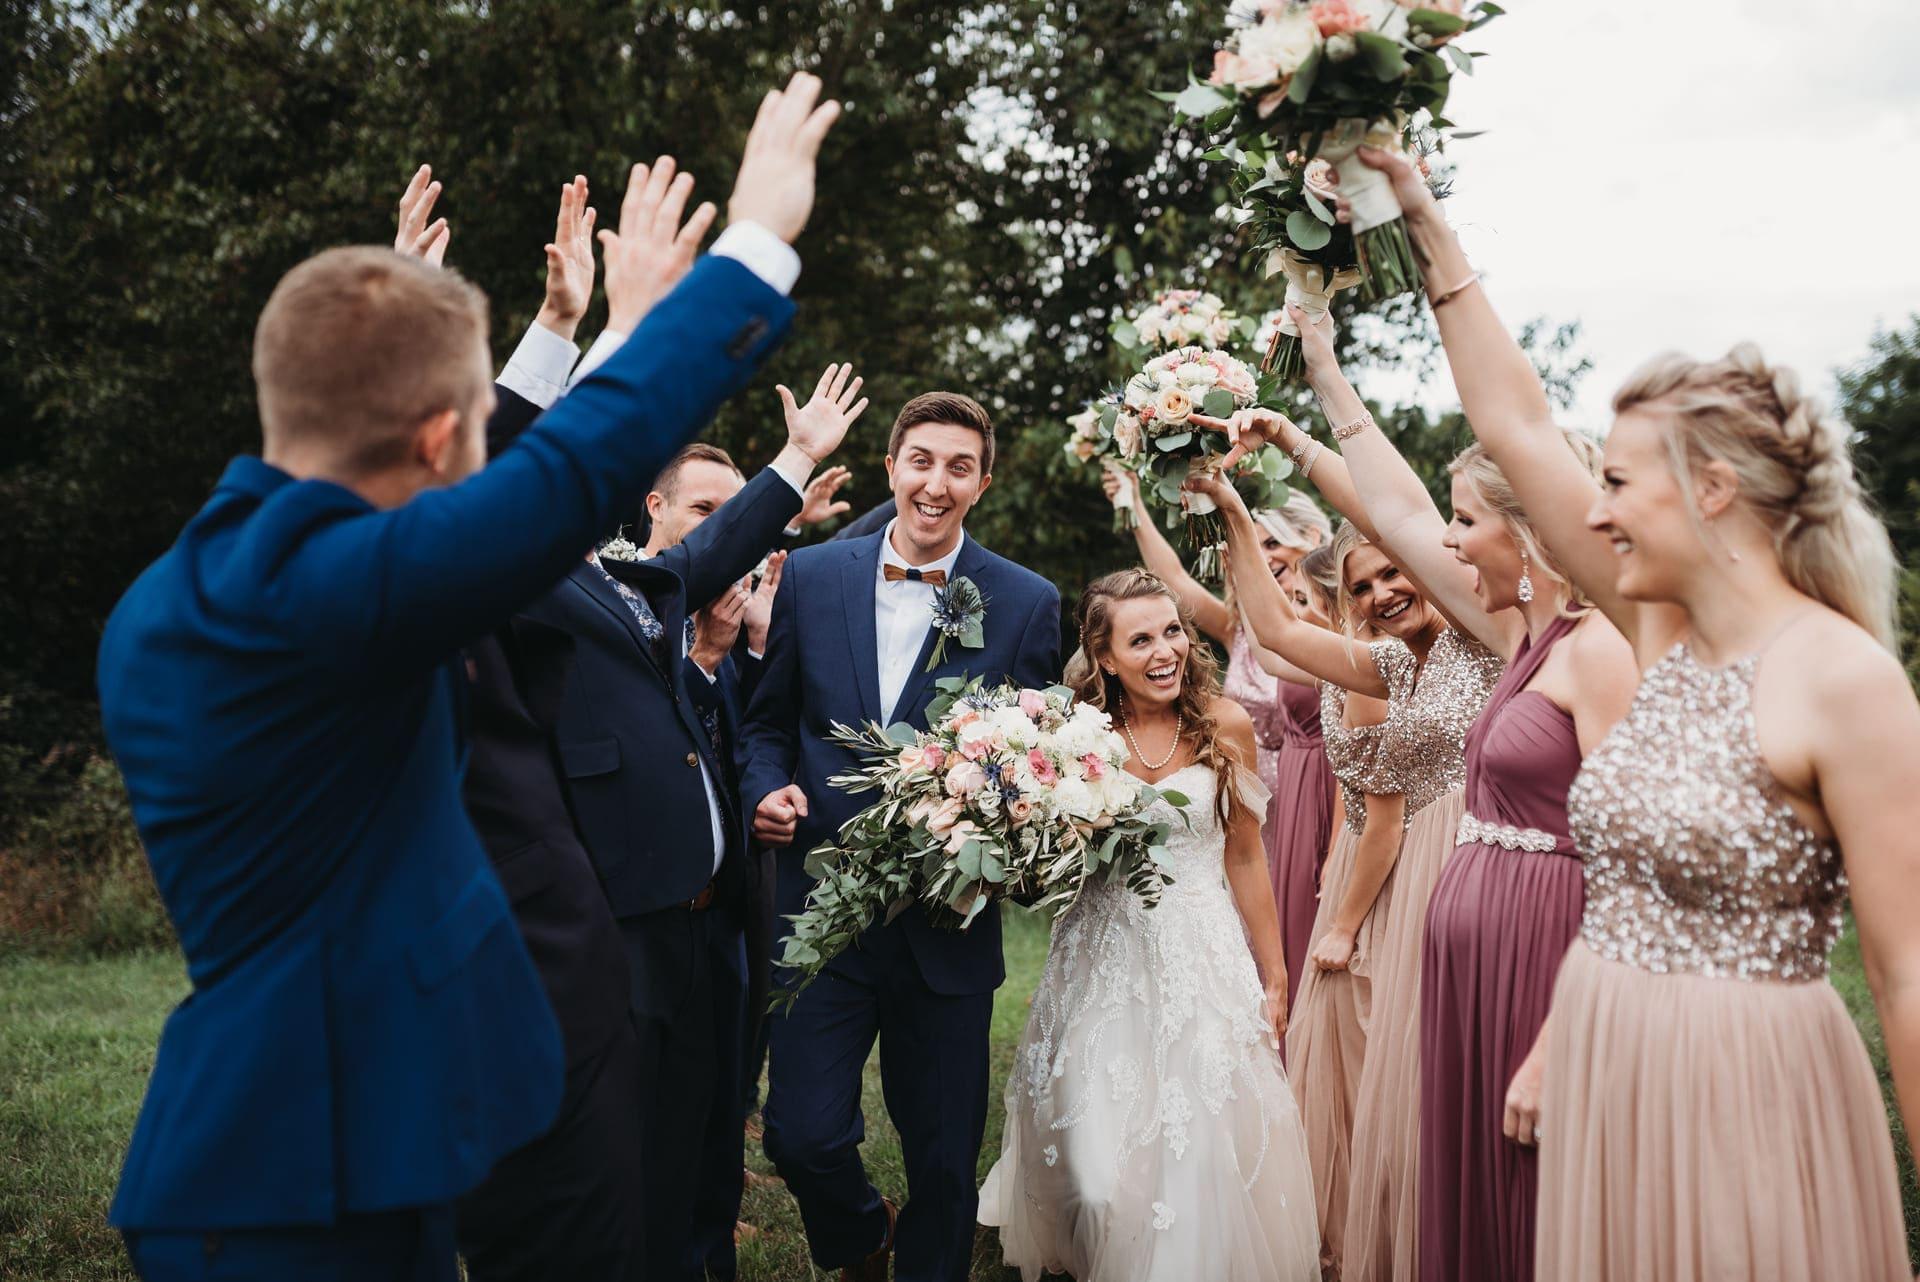 Happy Brides Richland Michigan Wedding Photography